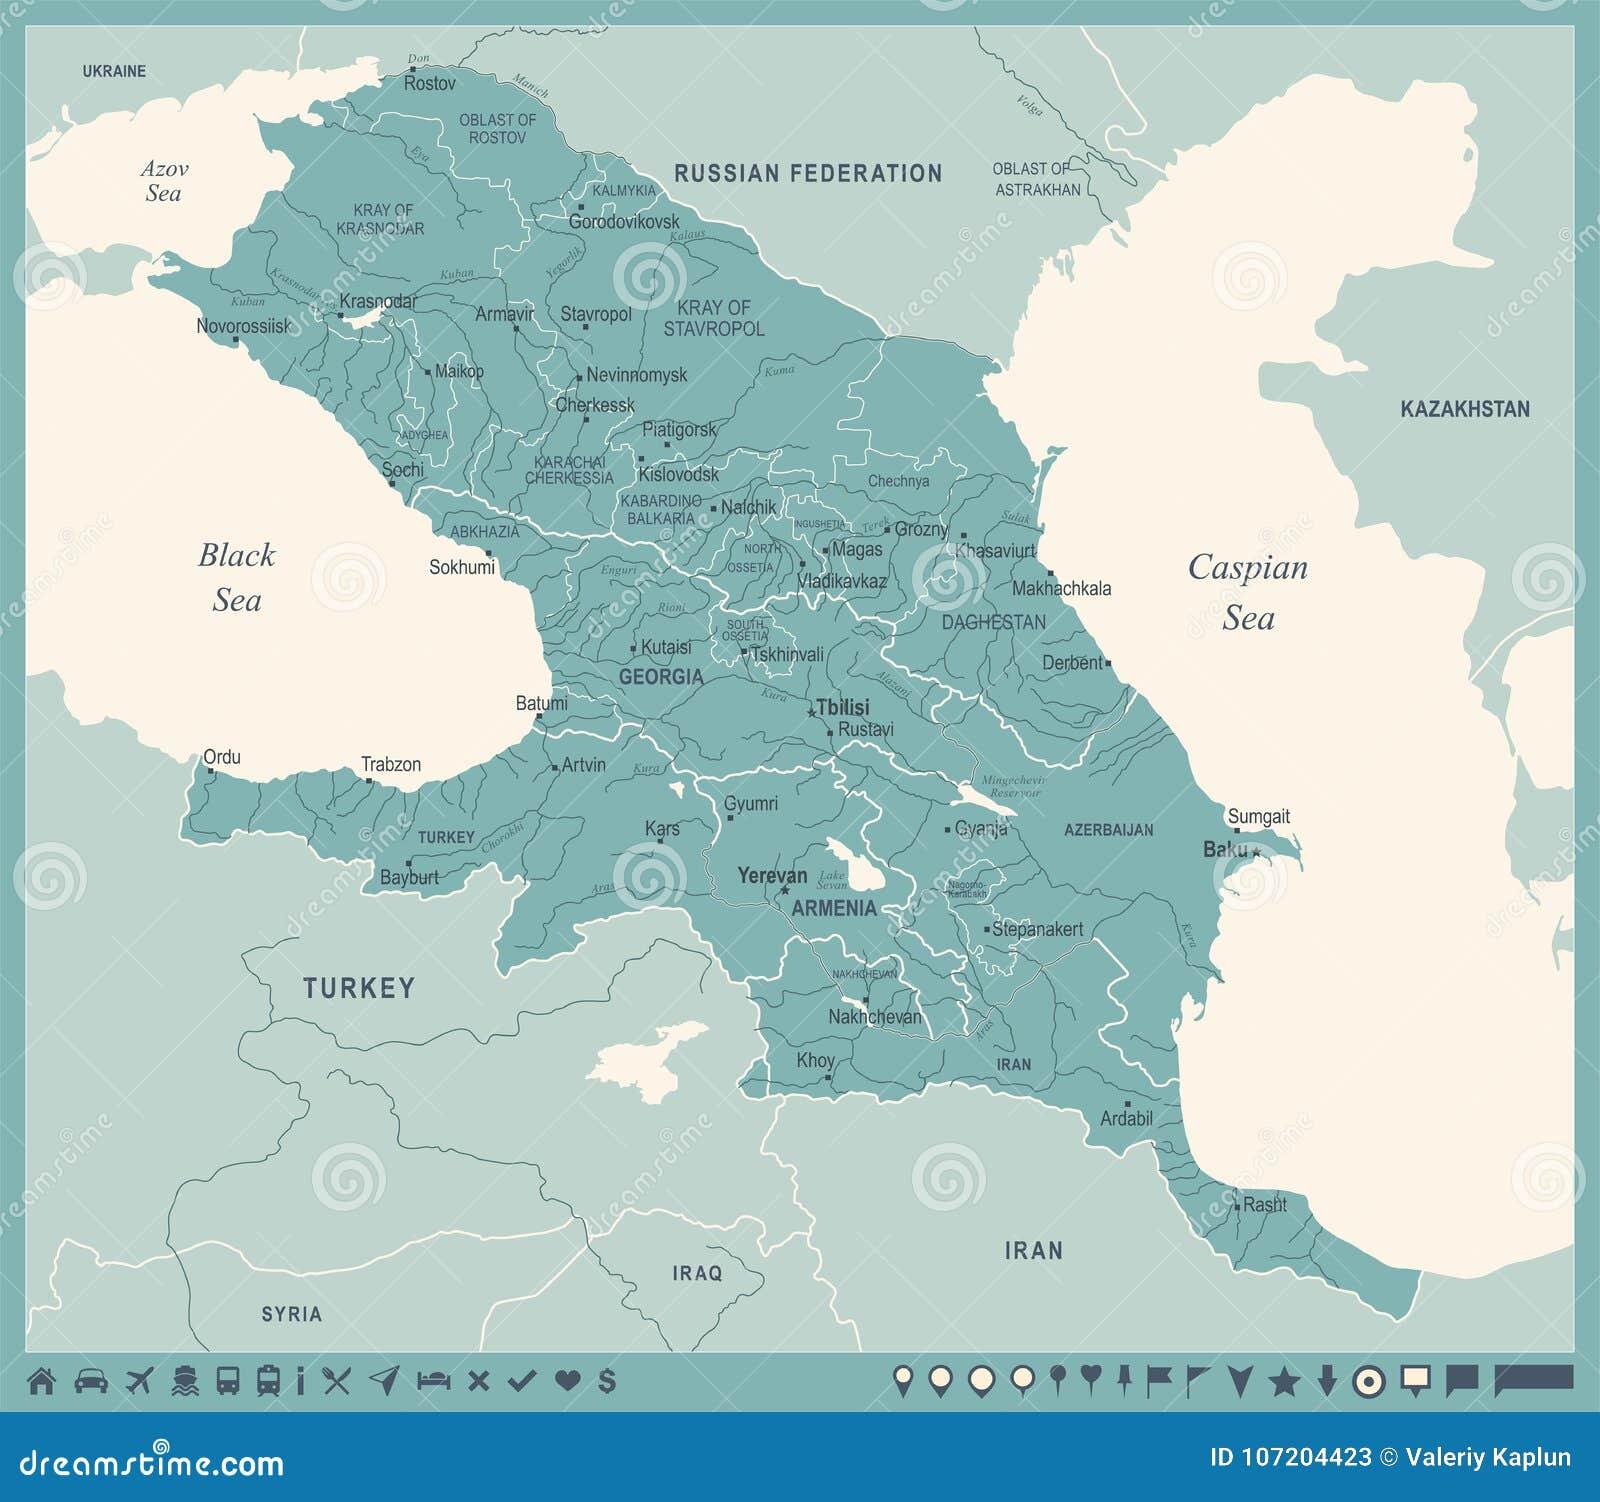 Region S Karte.Kaukasus Regions Karte Weinlese Vektor Illustration Stock